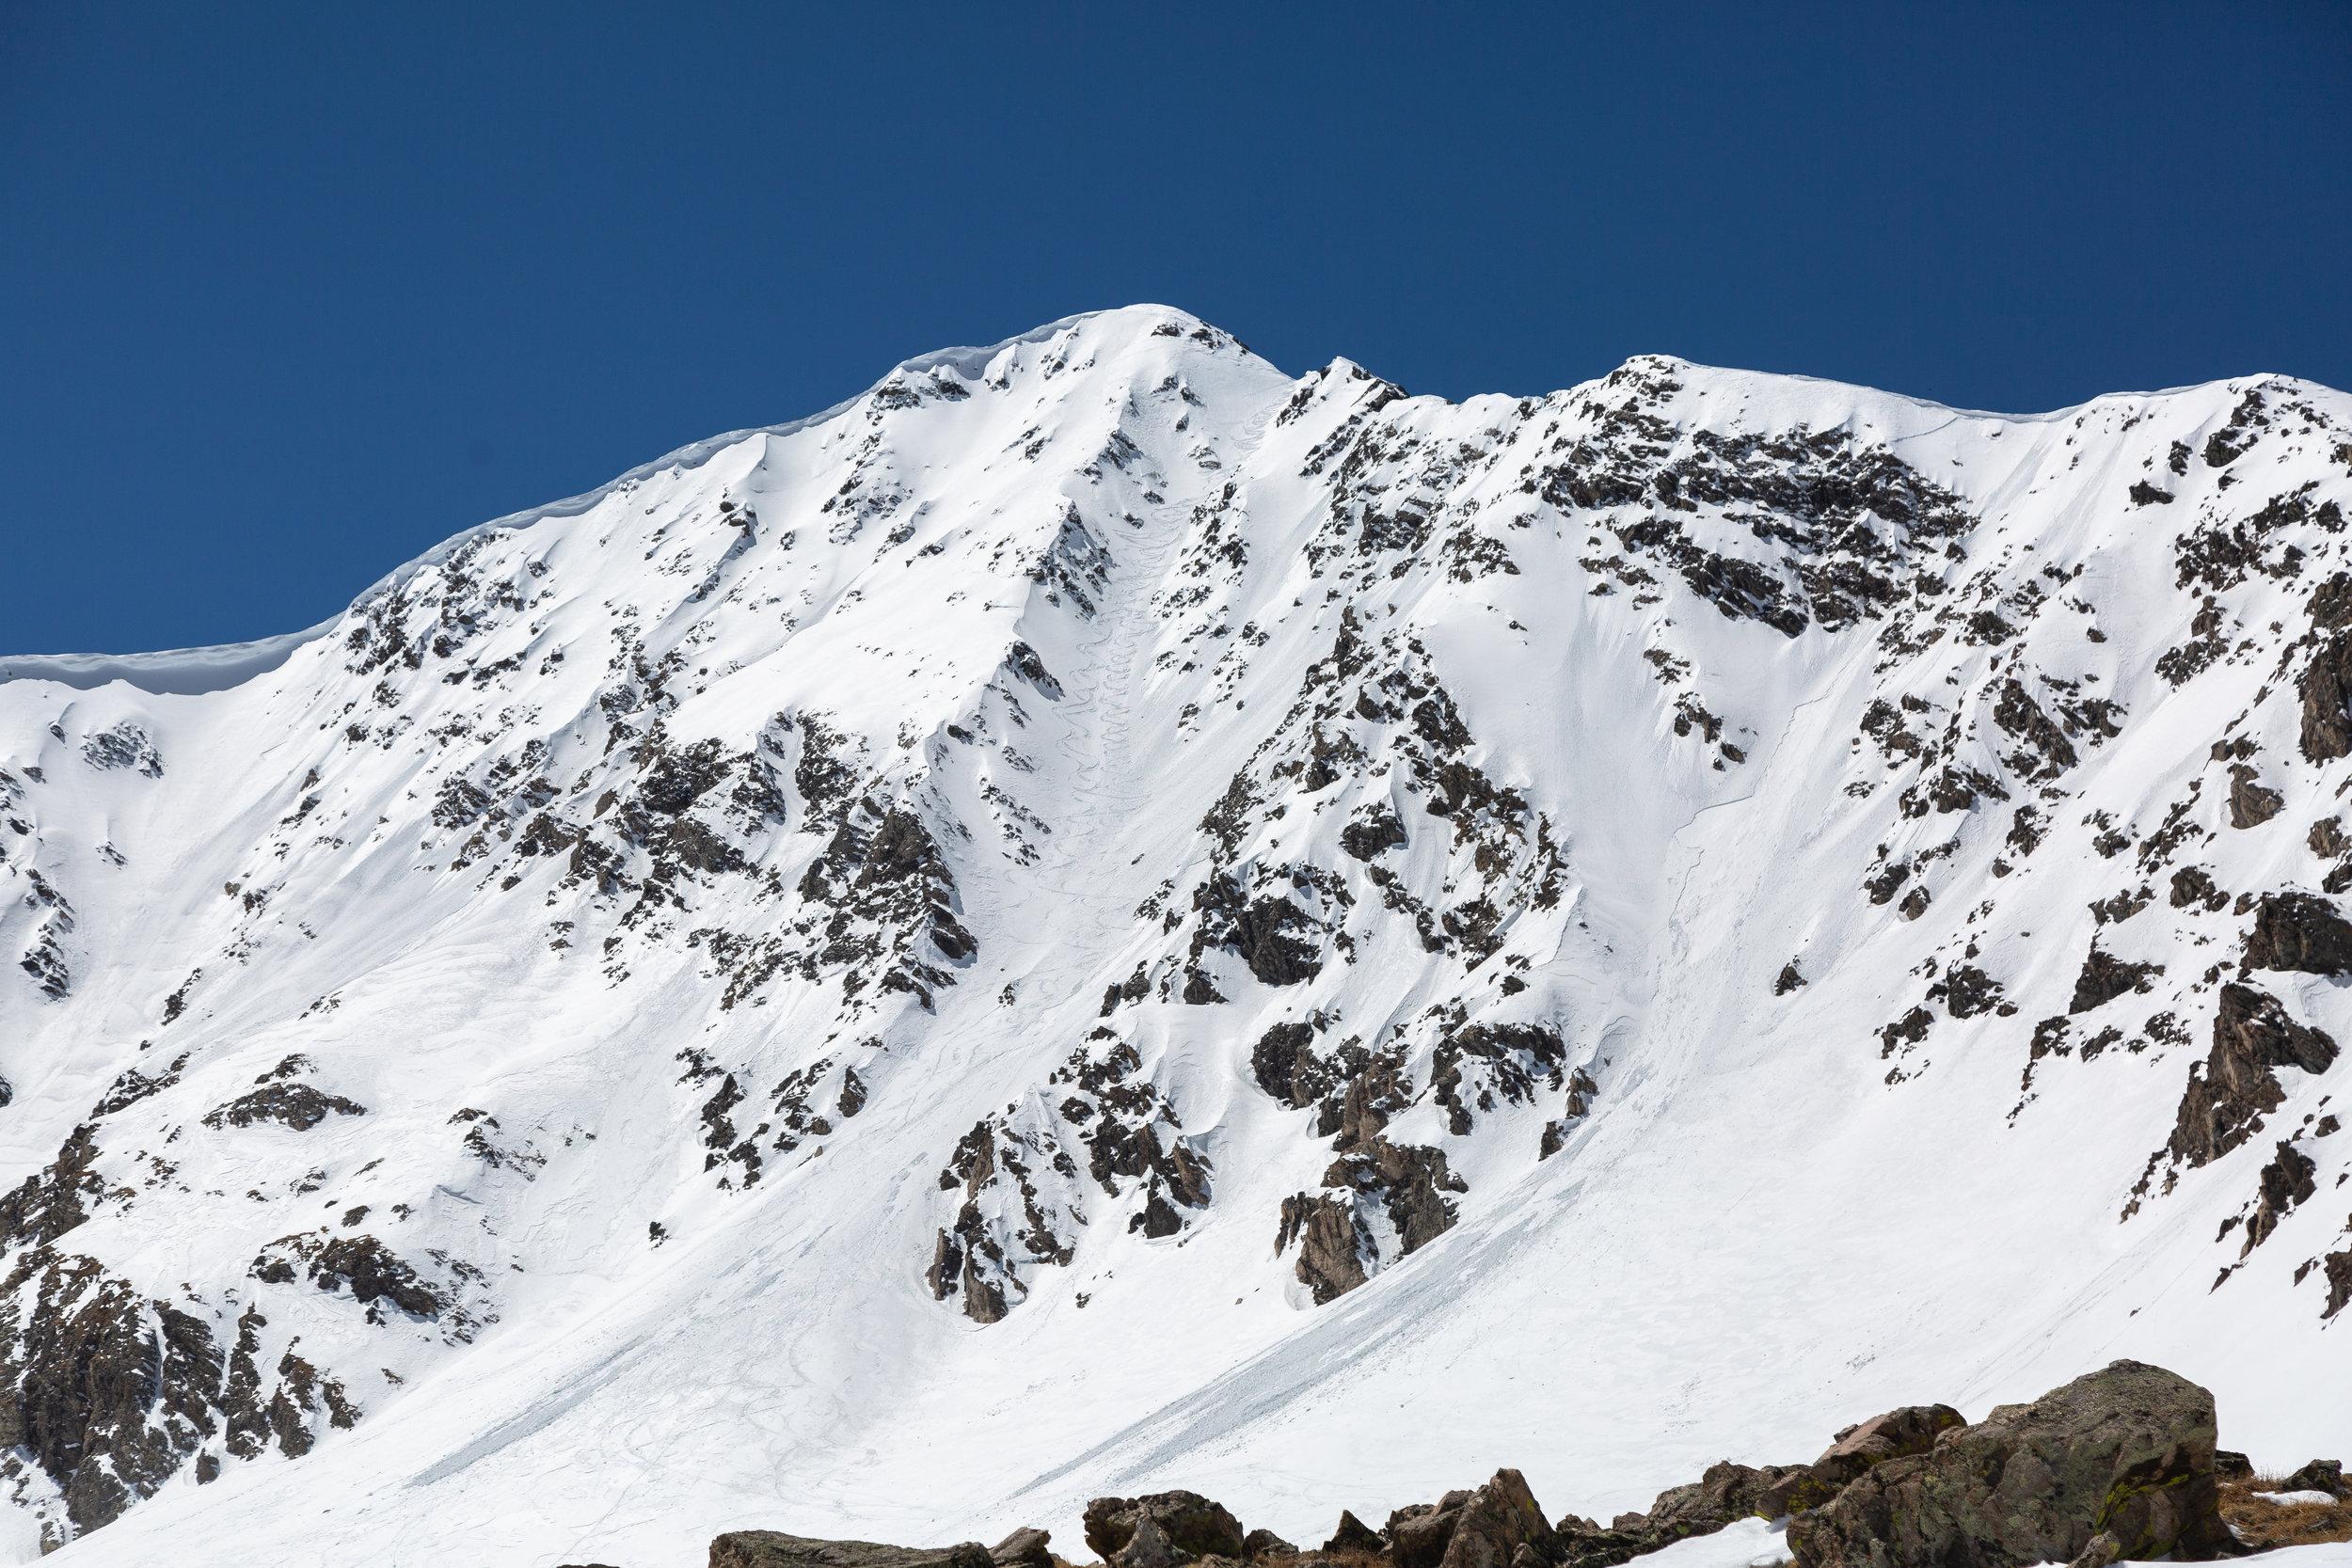 JTG_Skiing-19.jpg